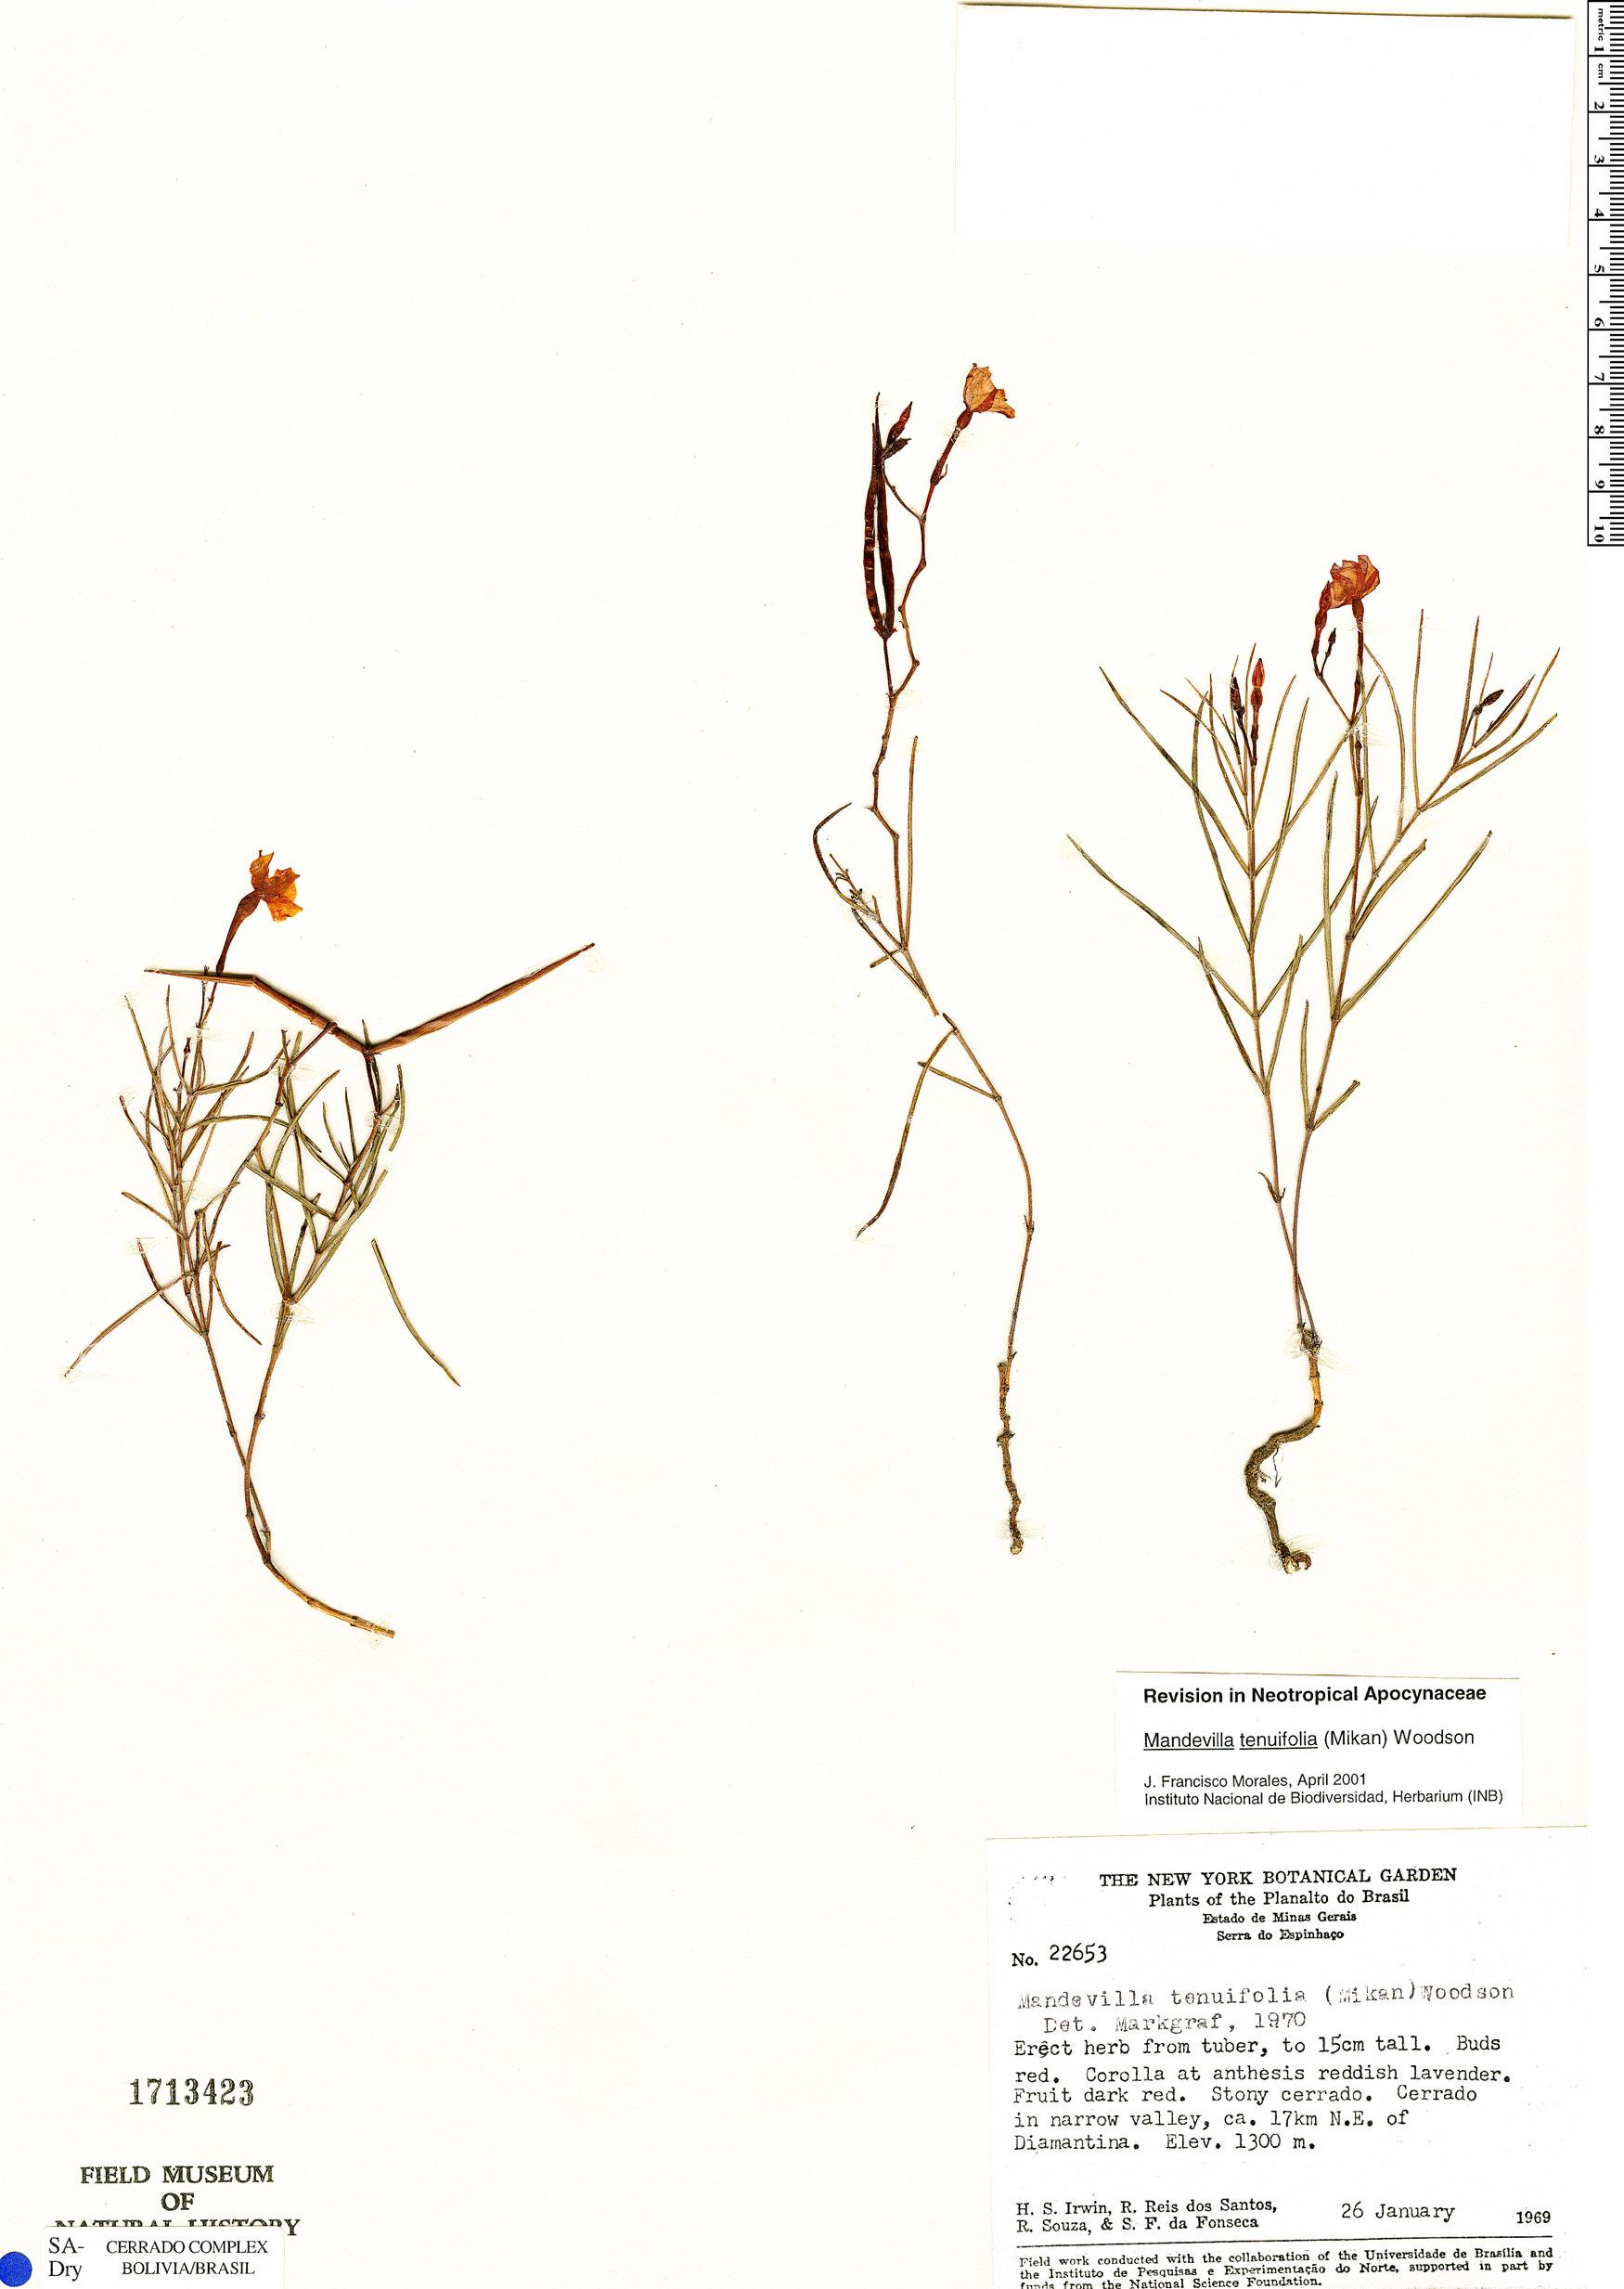 Specimen: Mandevilla tenuifolia